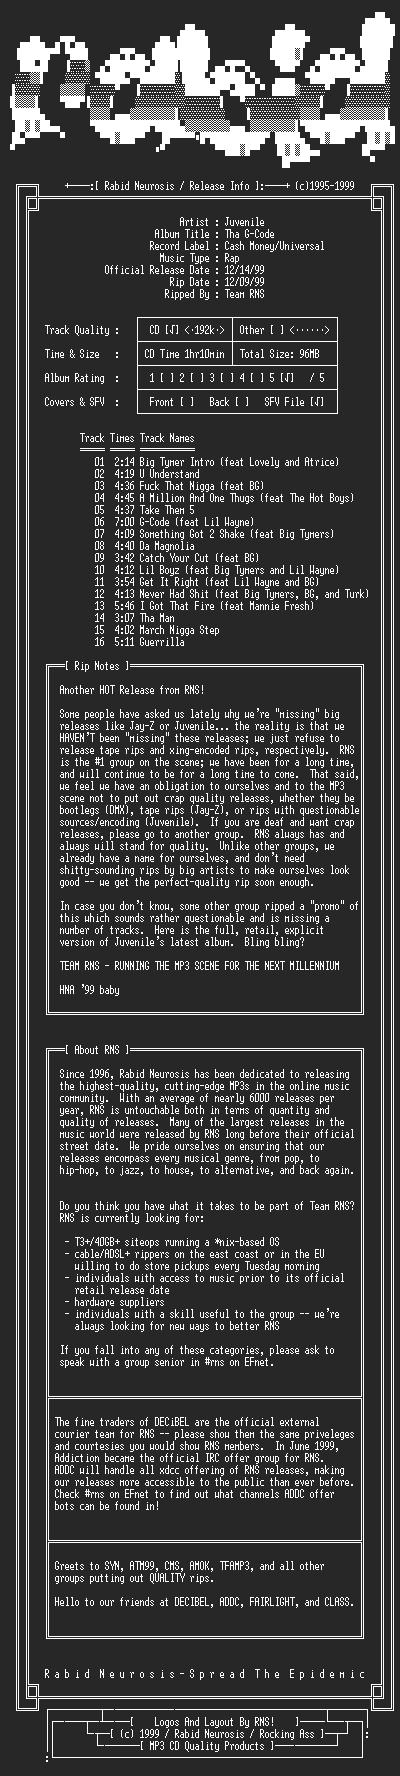 NFO file for Juvenile-Tha_G_Code-1999-RNS